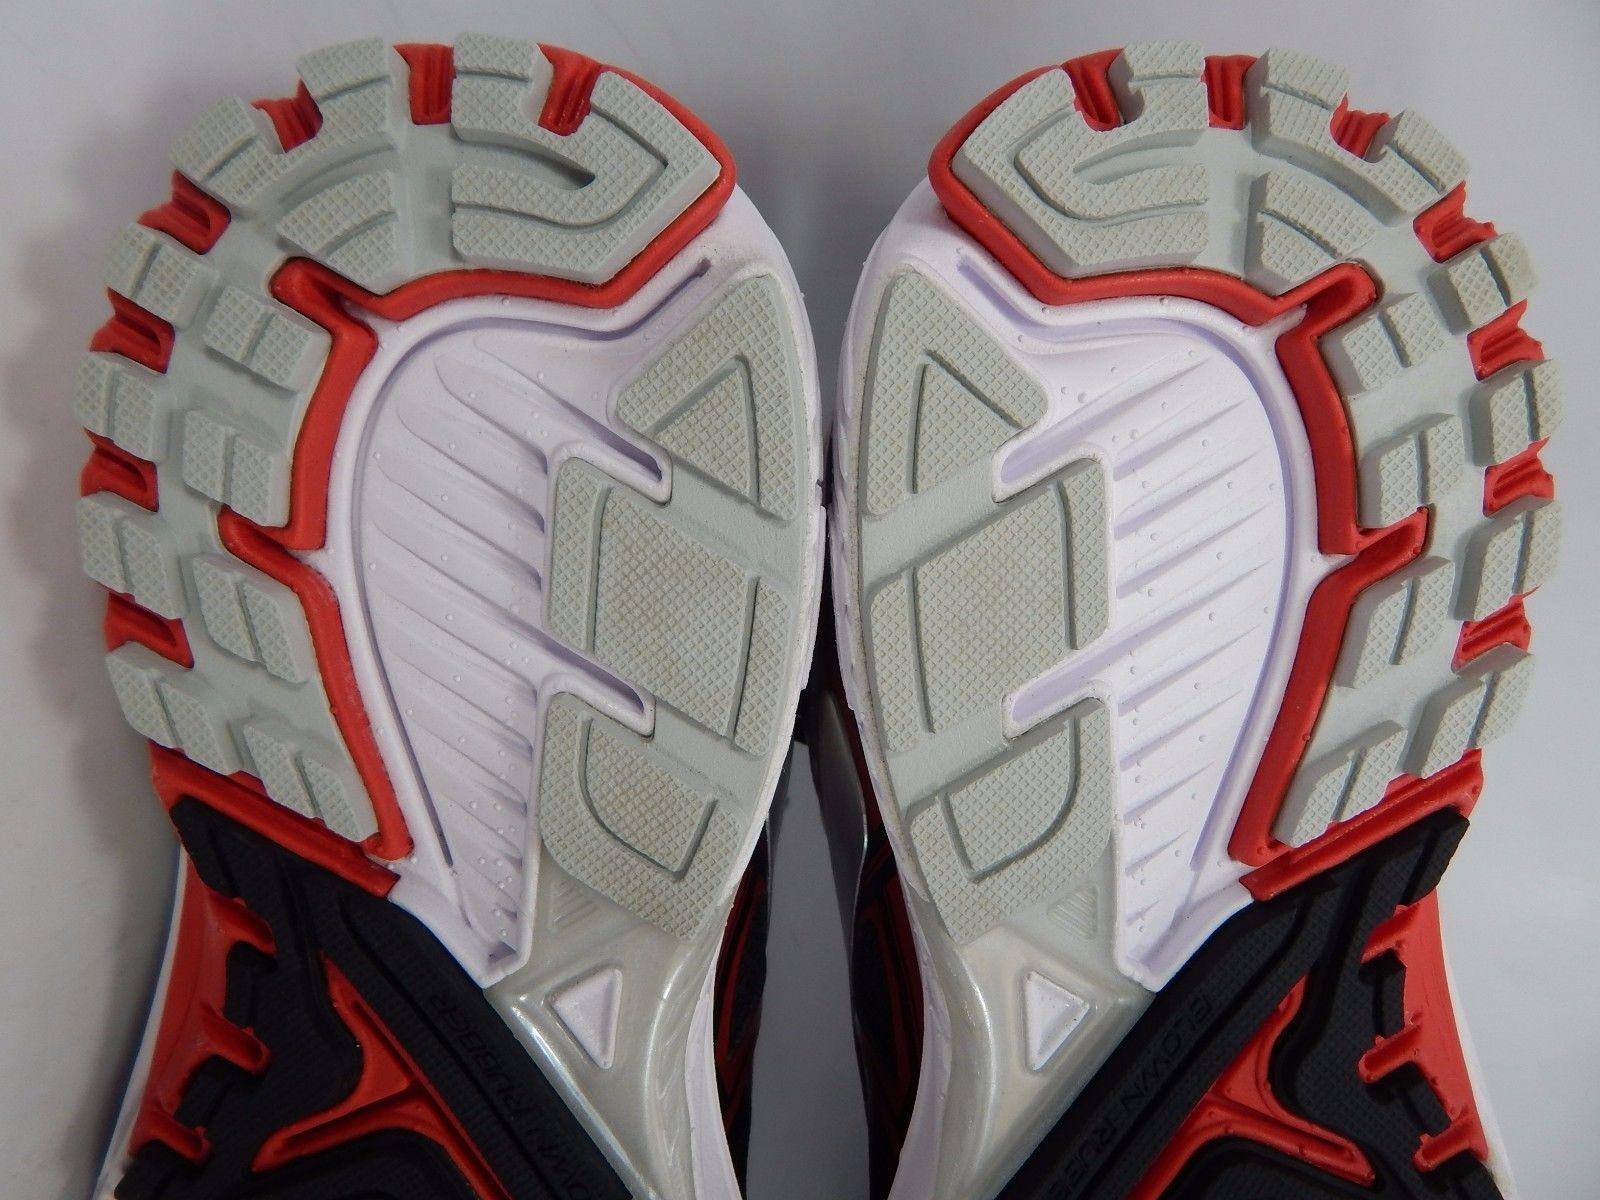 Brooks Ravenna 7 Men's Running Shoes Size US 8 M (D) EU 41 Black Red 1102171D062